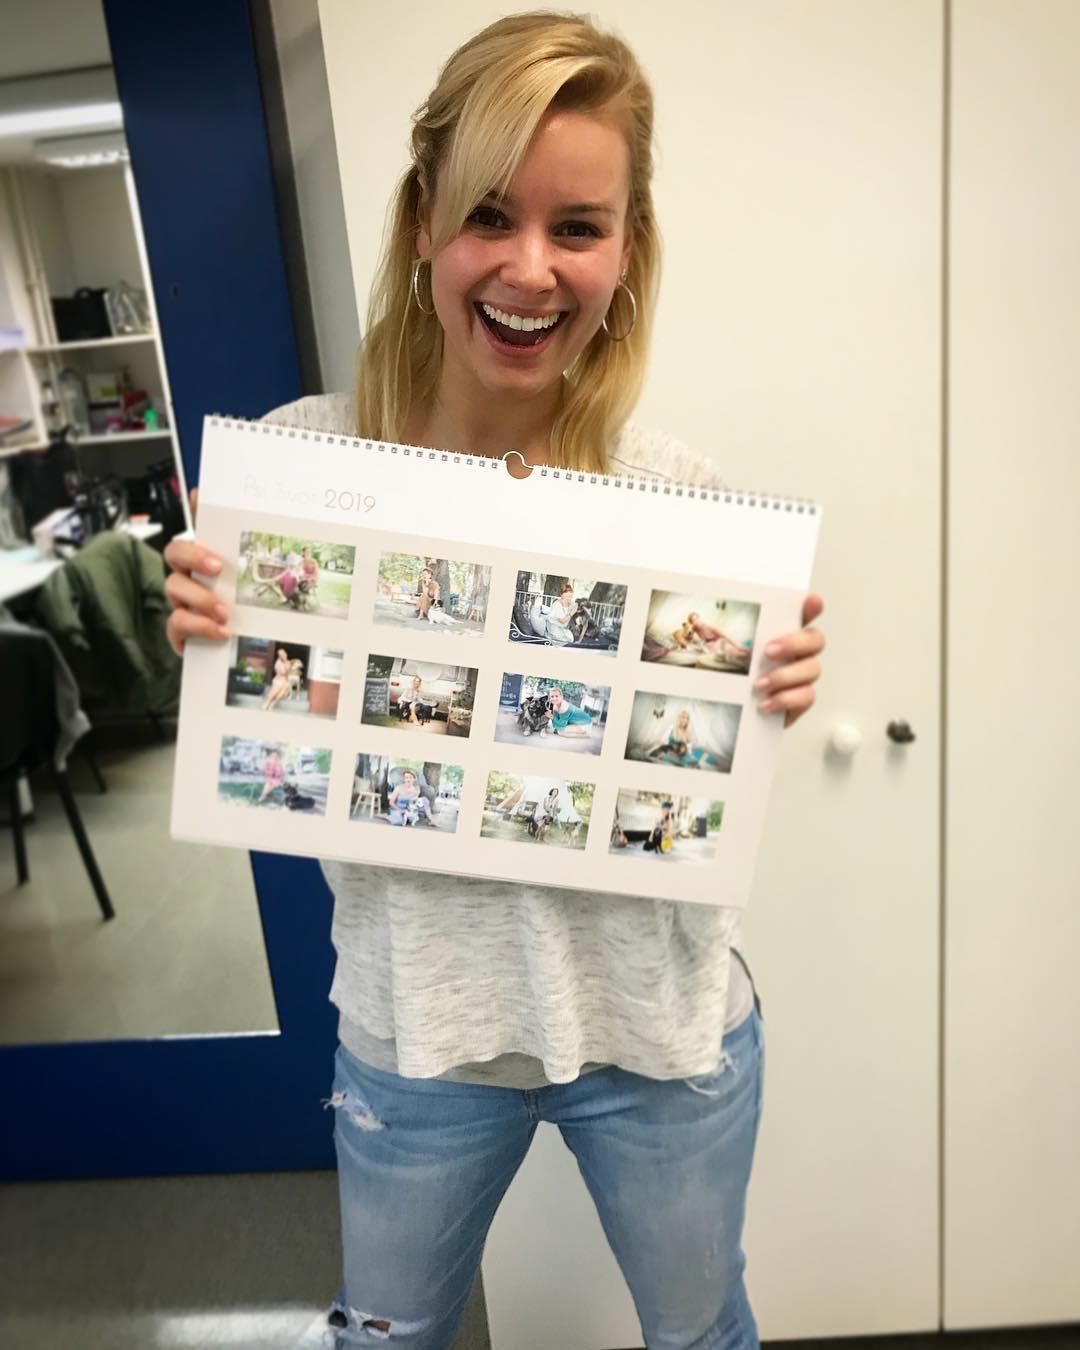 Patrície Solaříková a charitativní kalendář. Zdroj: Instagram Patrície Solaříkové